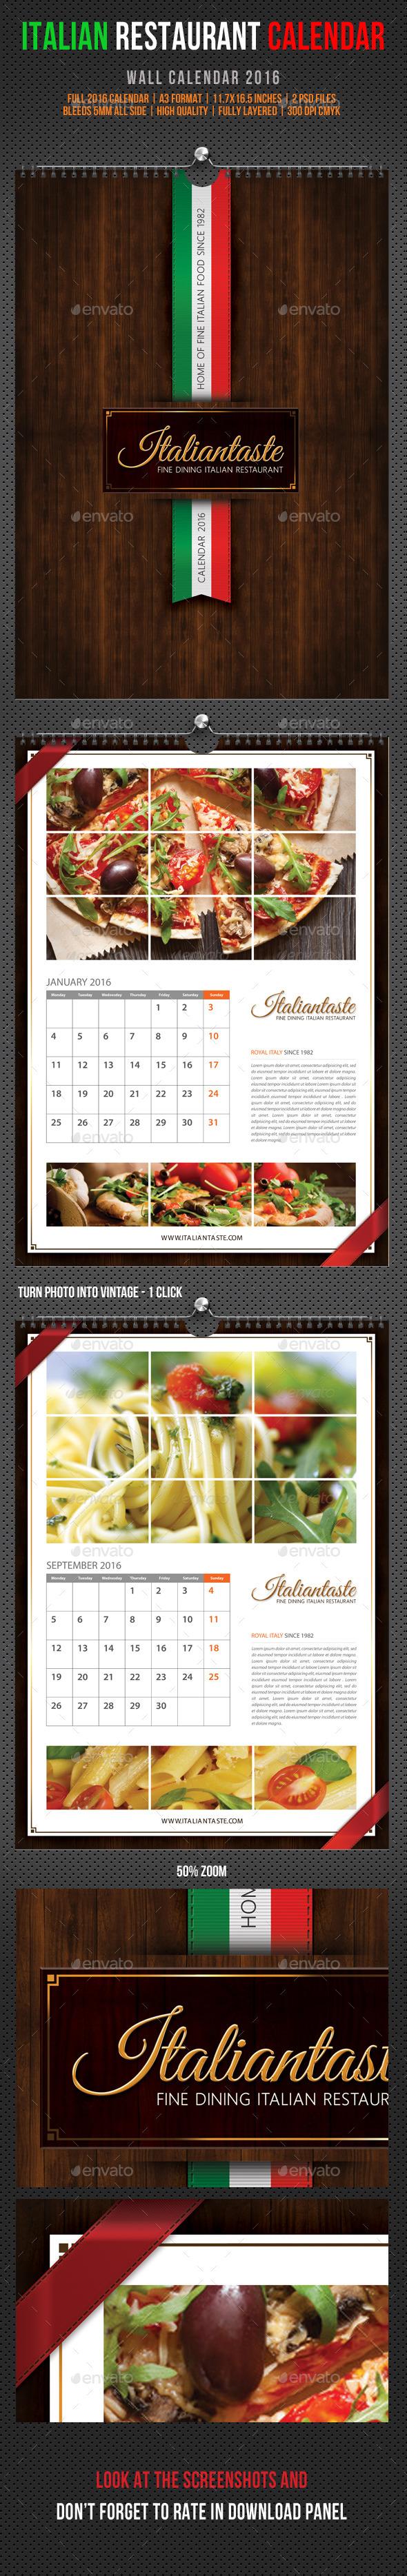 GraphicRiver Italian Restaurant Wall Calendar 2016 11833616